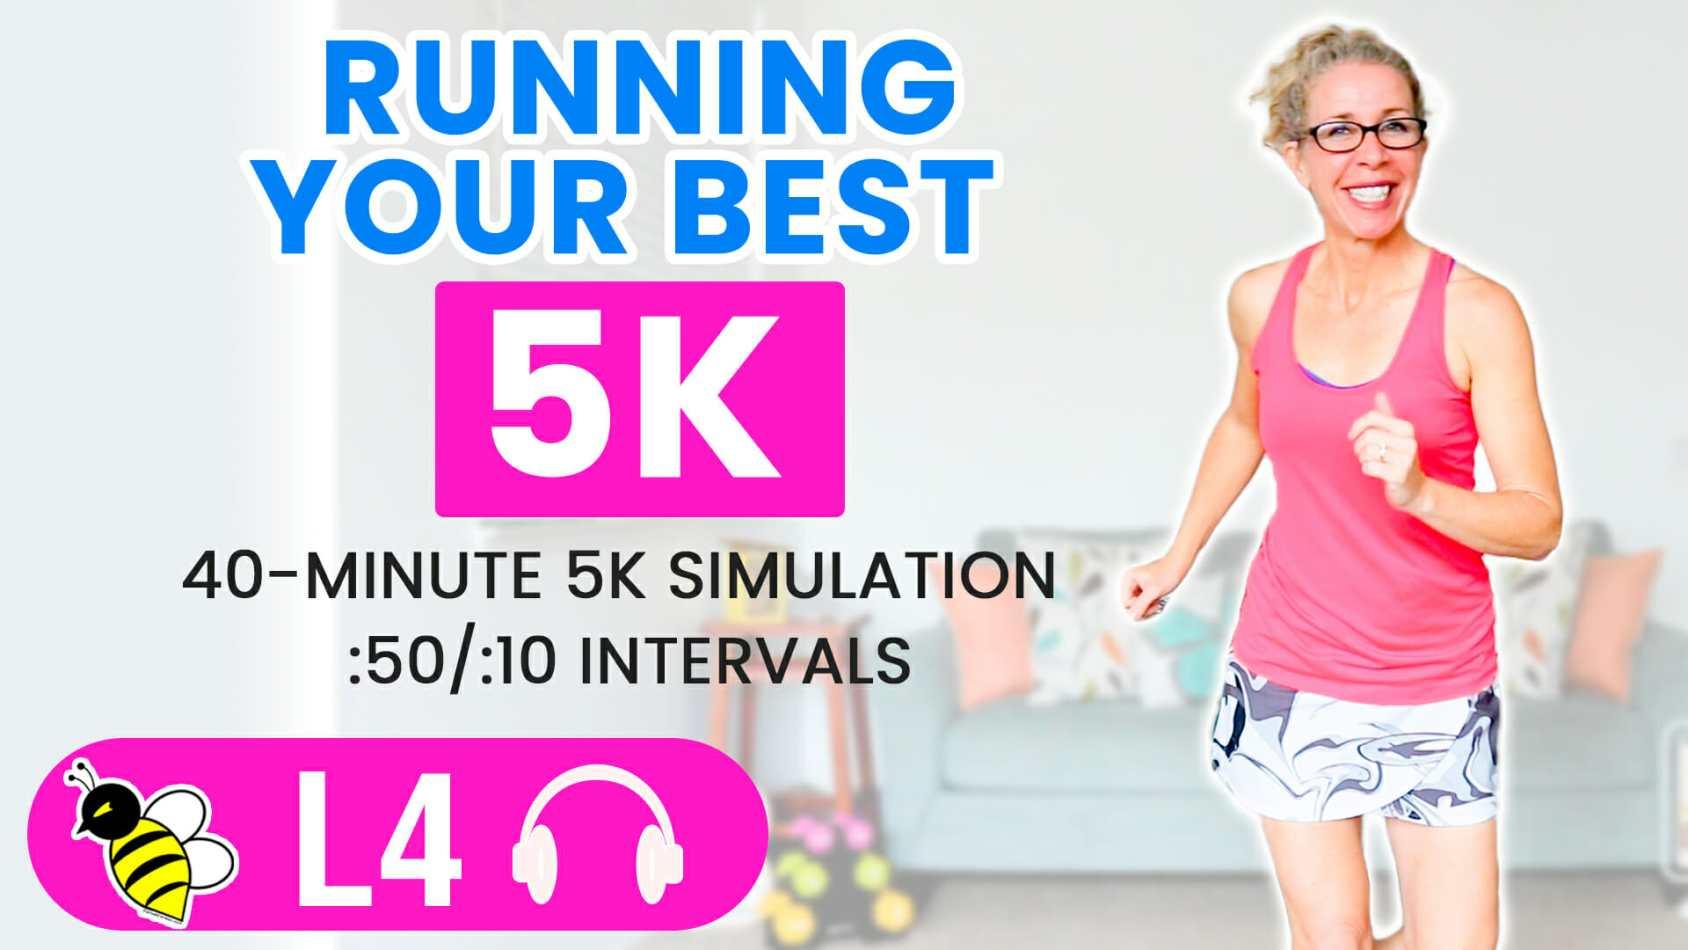 Running Your BEST 5k 40 minute RUNNING workout